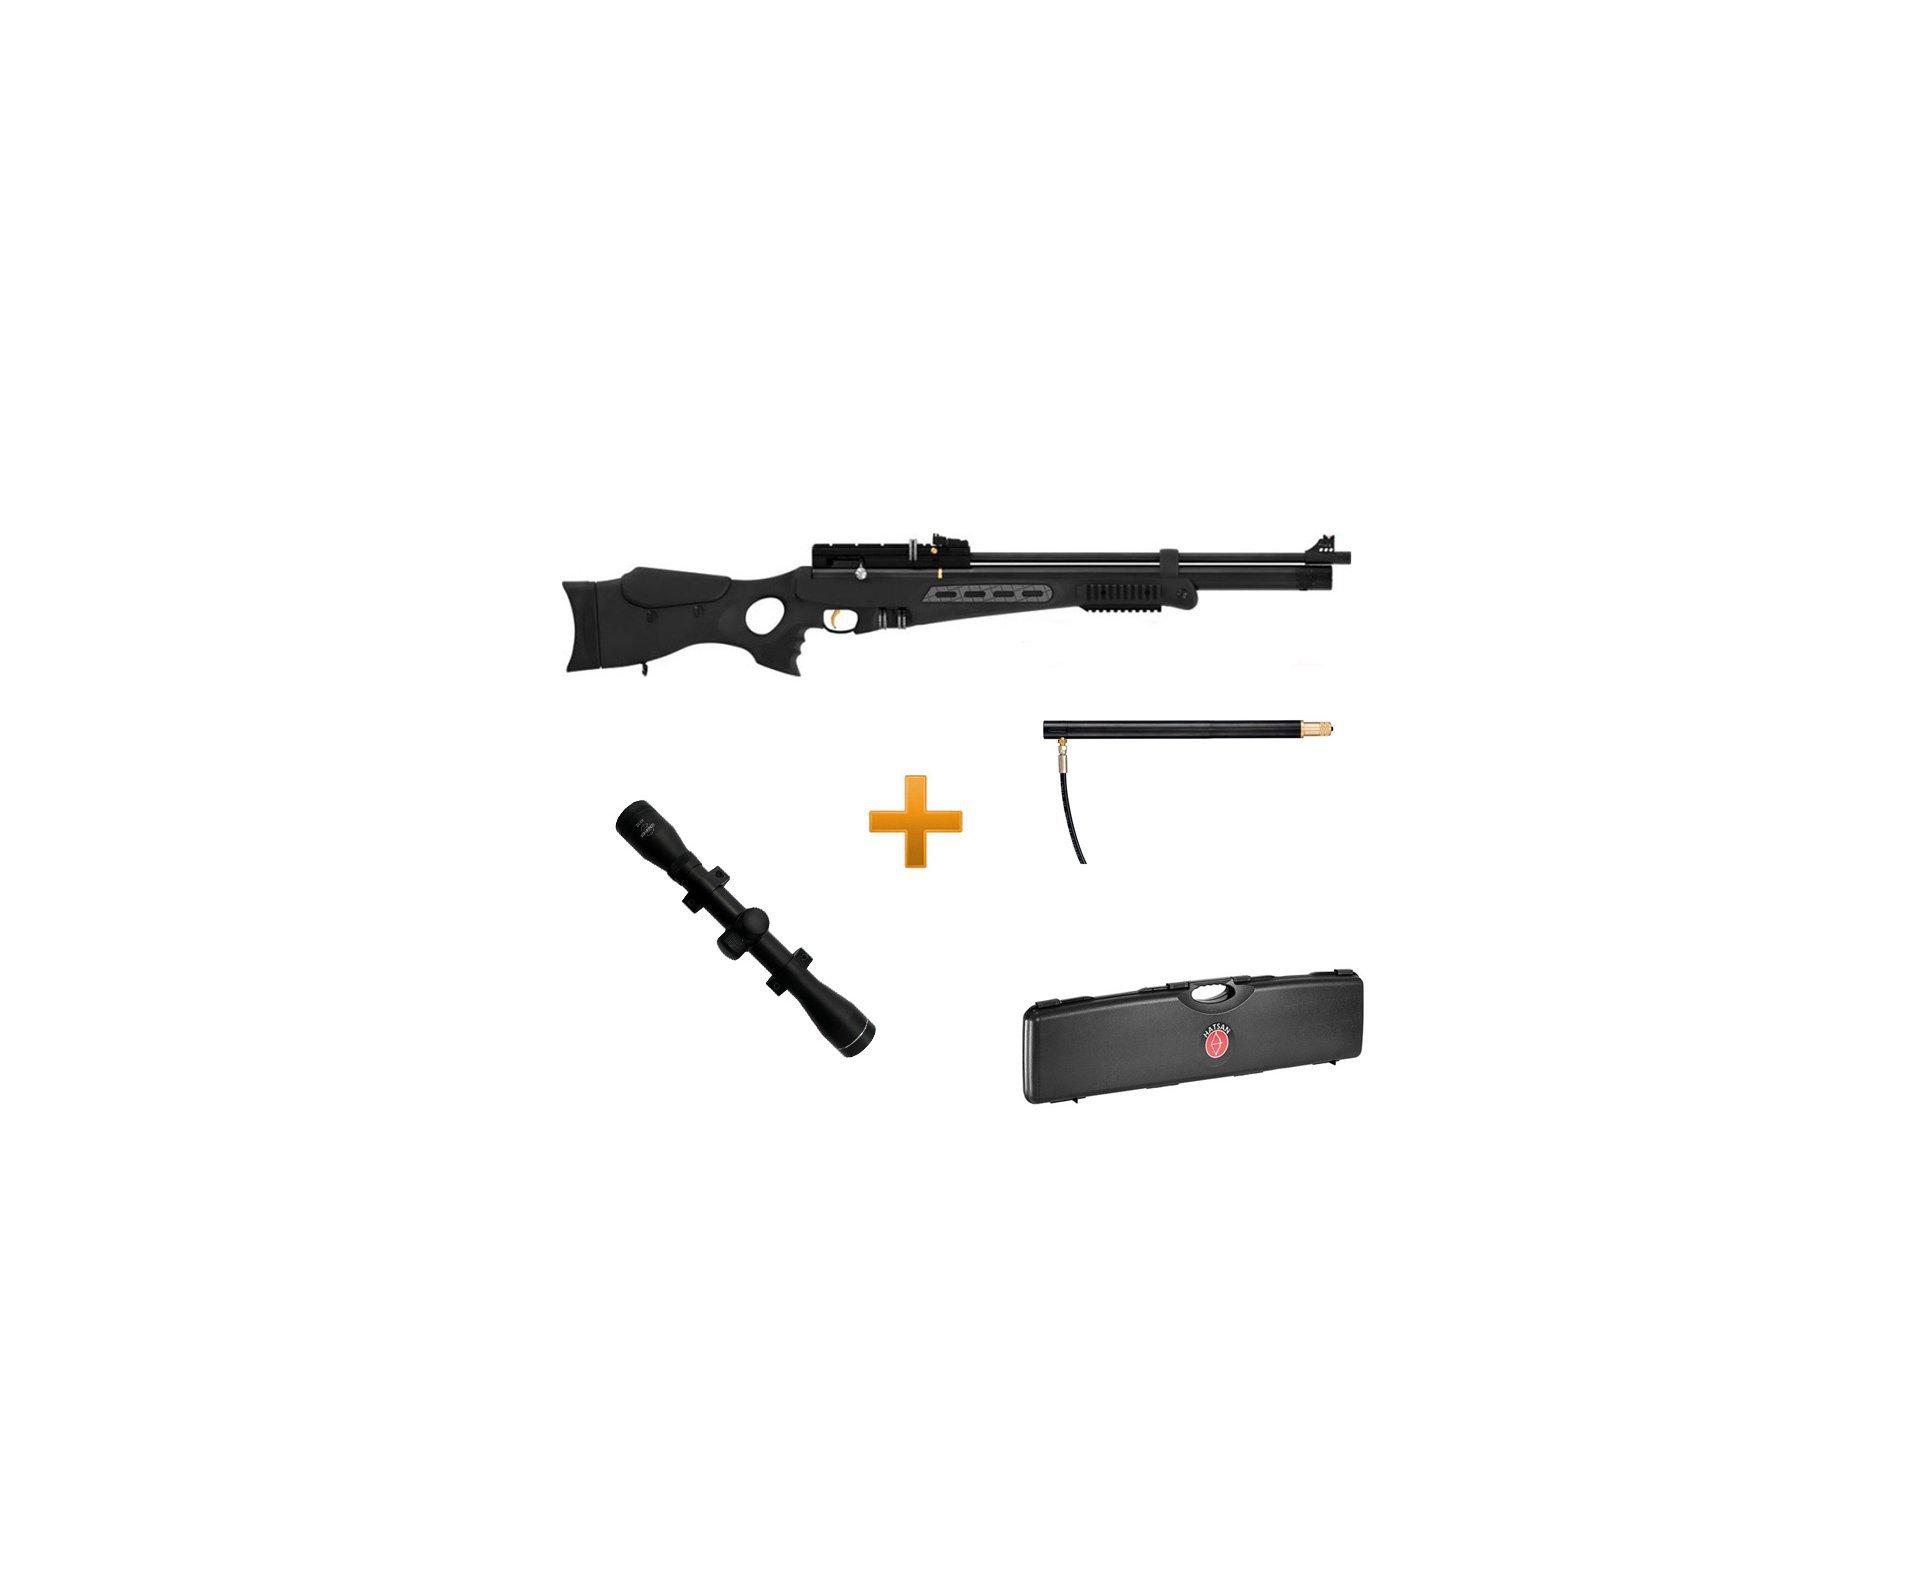 Carabina De Pressão Hatsan Bt65 Sb Elite - Cal 5,5 Mm + Case + Cilindro Extra -  Luneta 4x32 Ga Walther